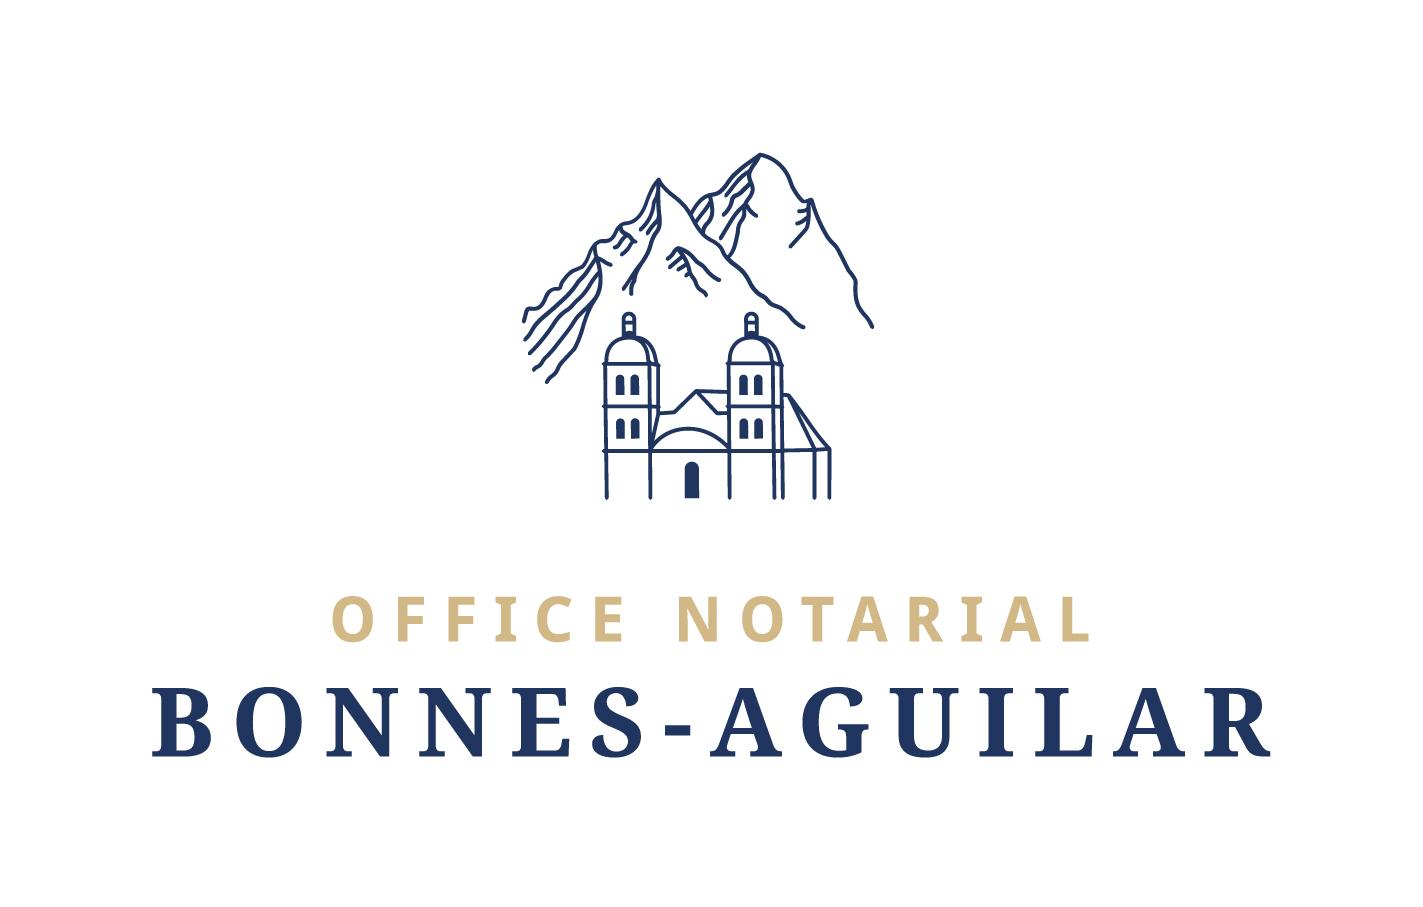 Office Notarial Bonnes Aguilar